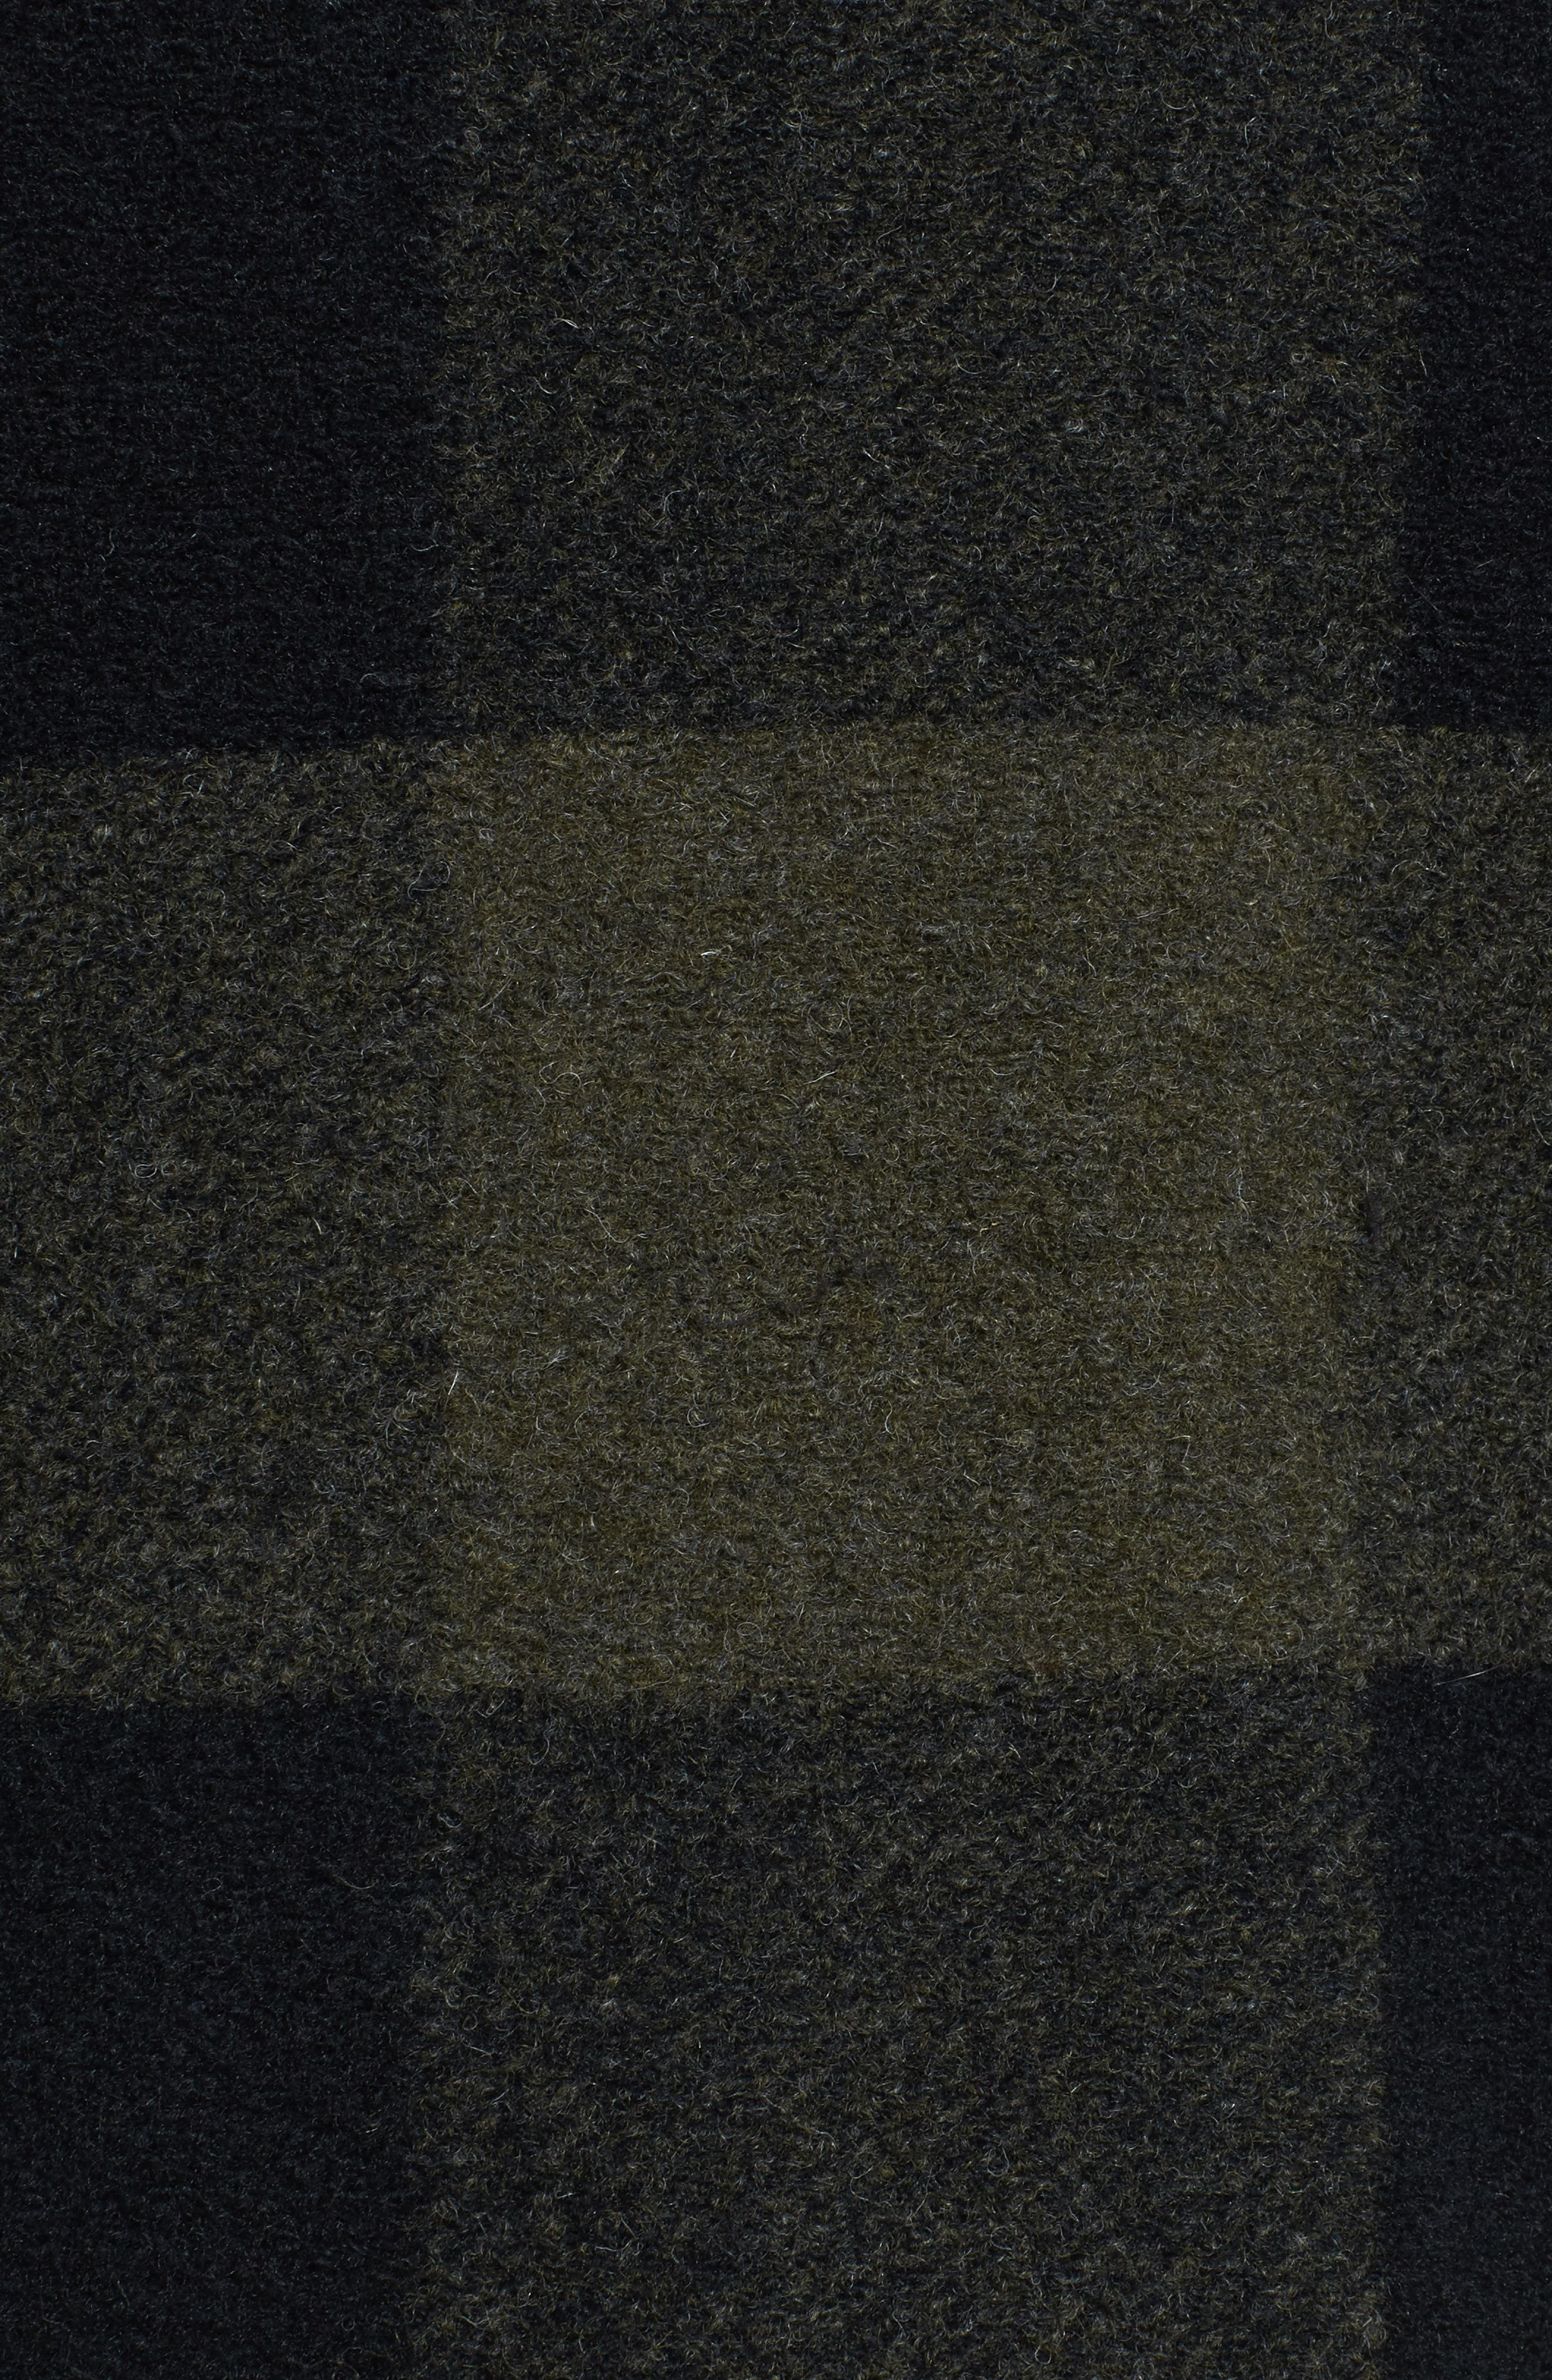 Paul Bunyan Plaid Wool Blend Barn Coat,                             Alternate thumbnail 5, color,                             Olive/ Black Plaid